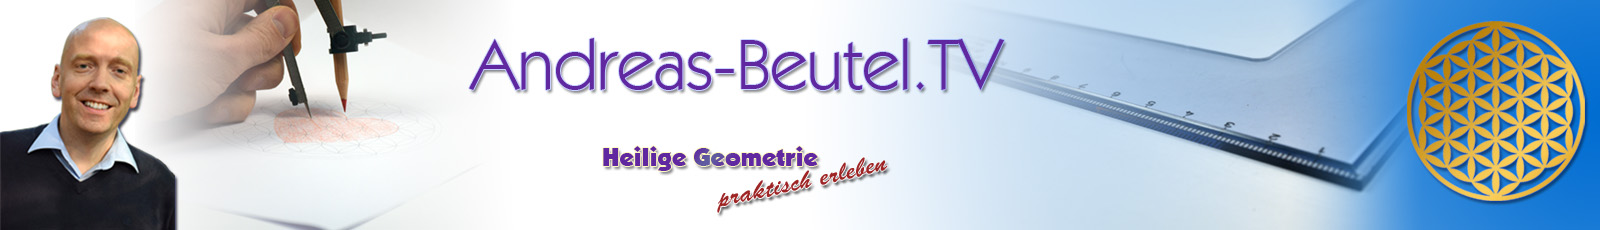 Andreas Beutel TV